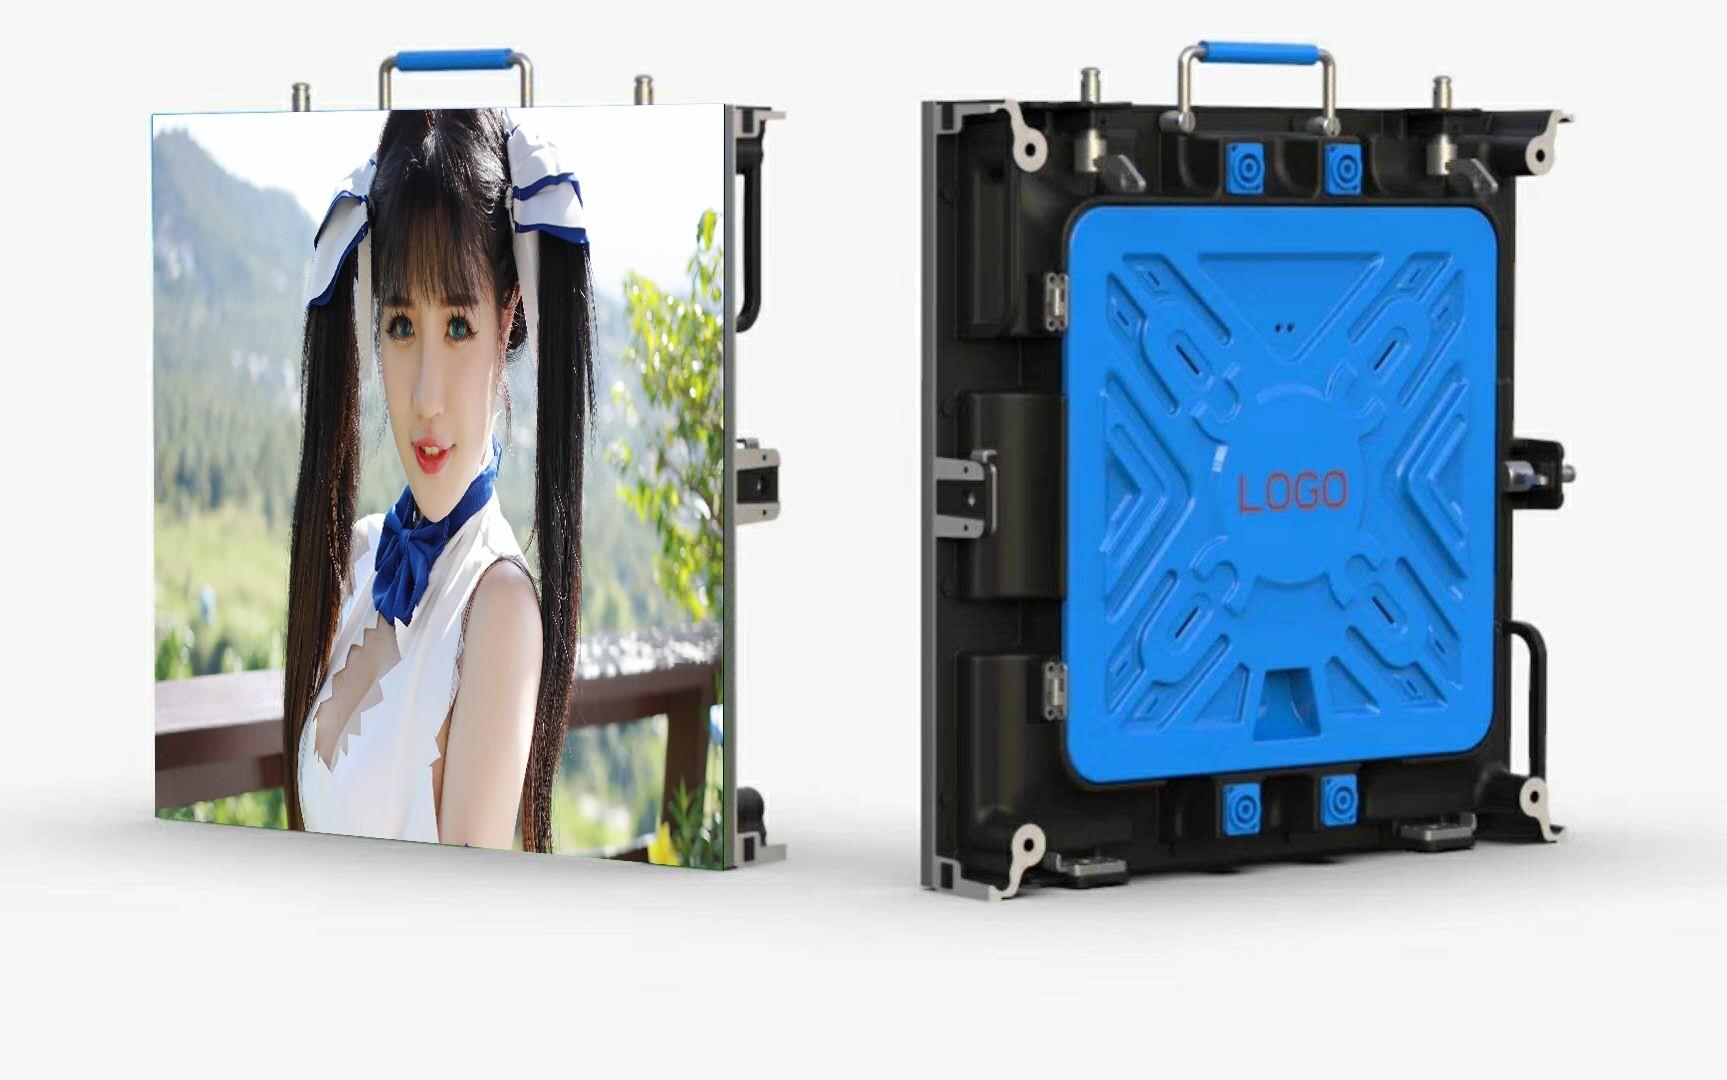 HD LED P1.923 indoor display screen Manufacturers, HD LED P1.923 indoor display screen Factory, Supply HD LED P1.923 indoor display screen